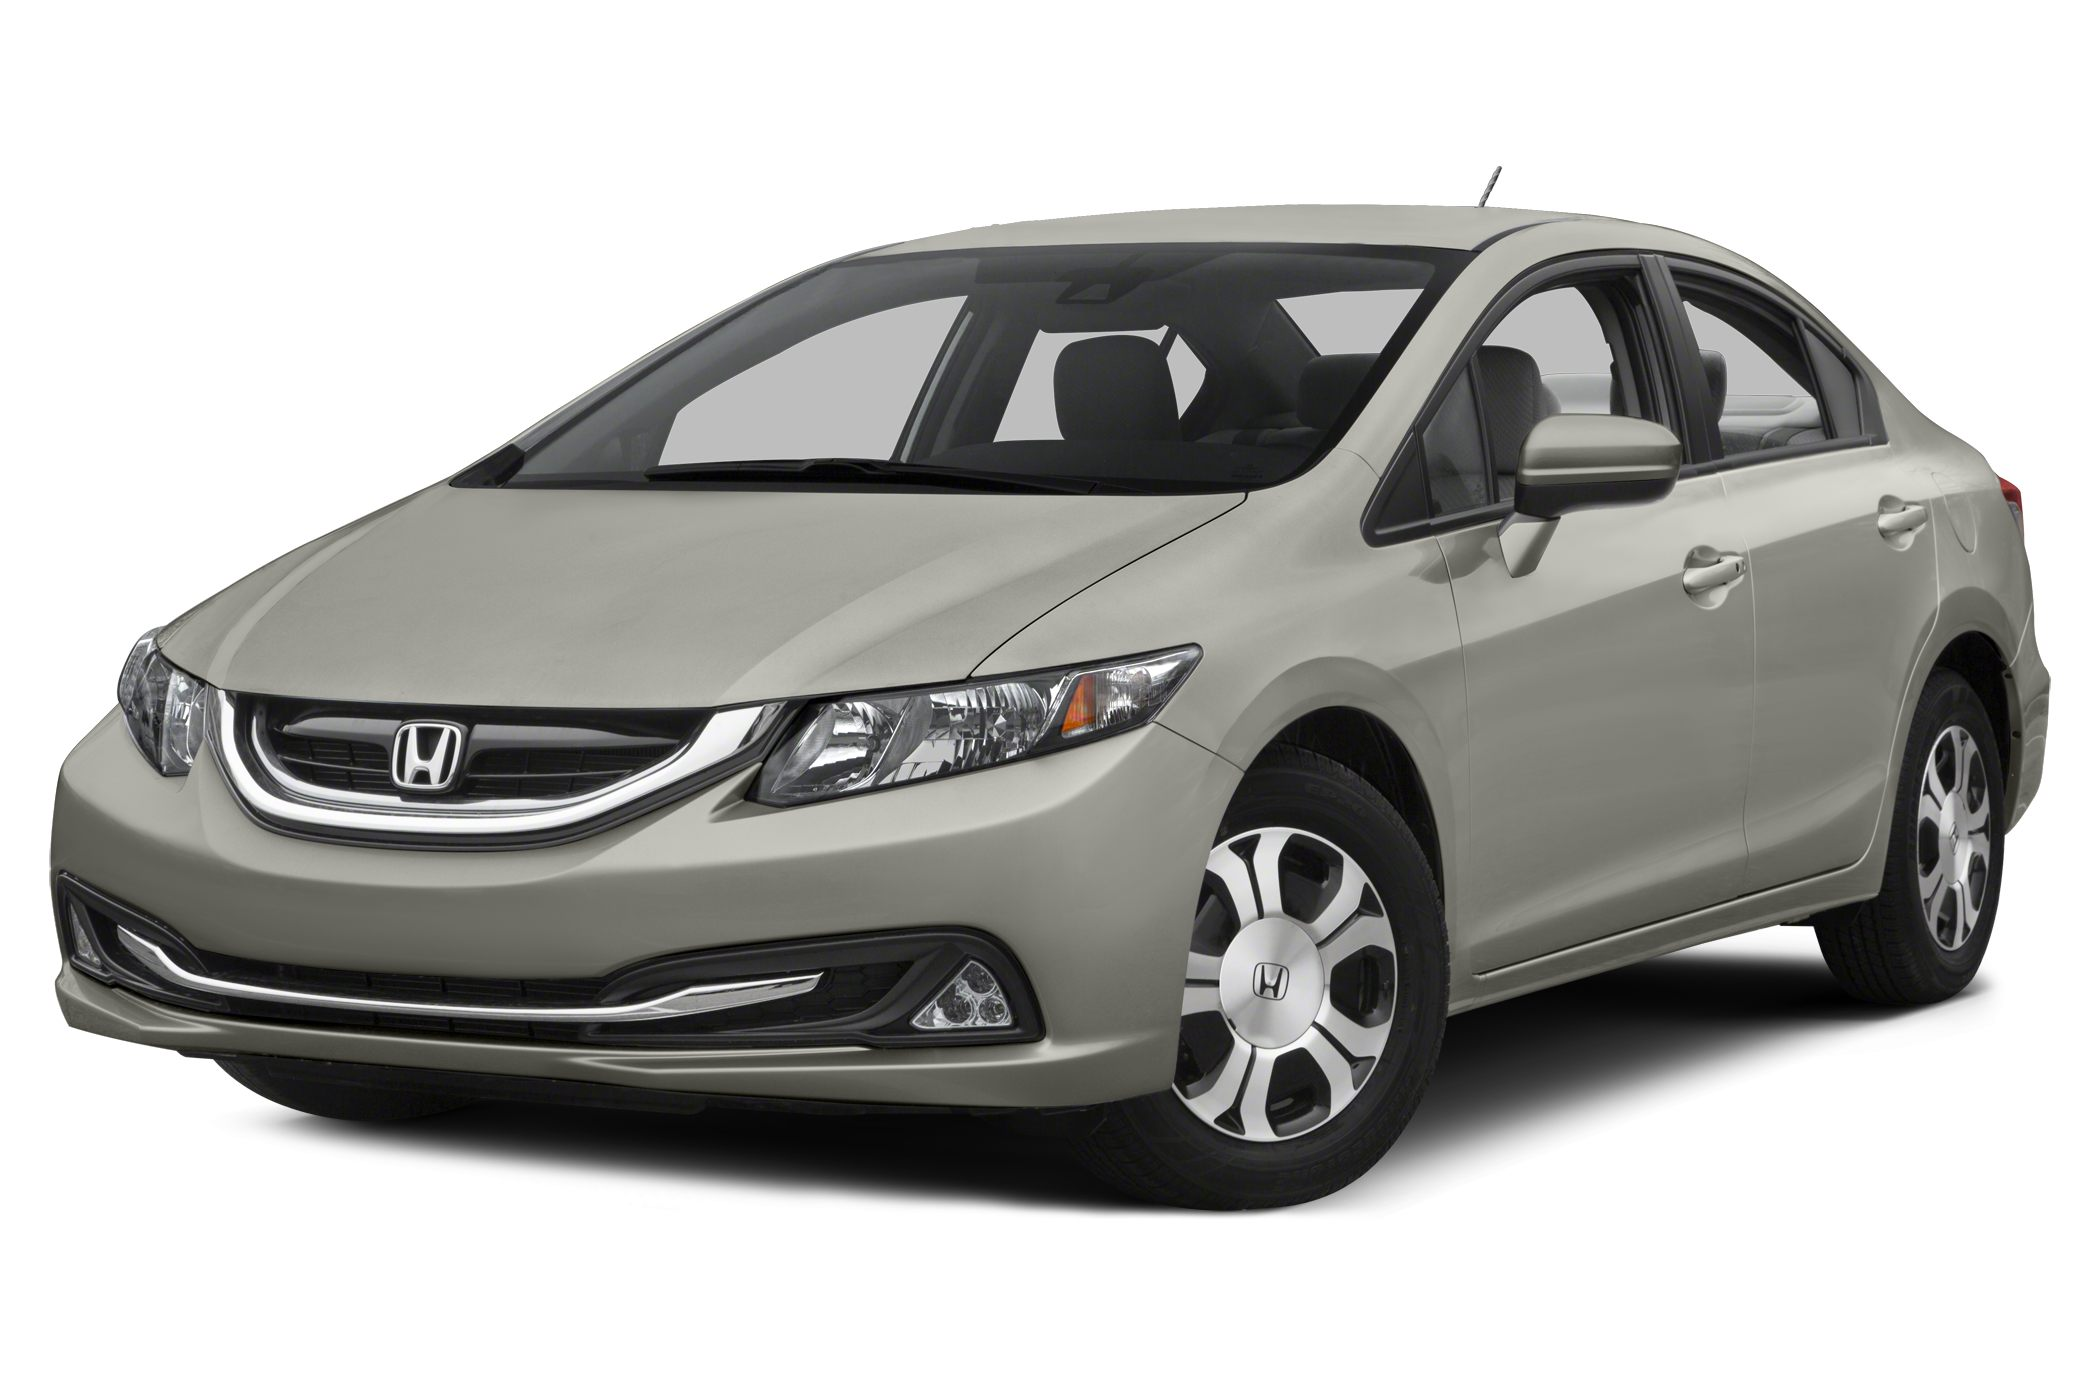 2015 Honda Civic Hybrid Specs Safety Rating & MPG CarsDirect